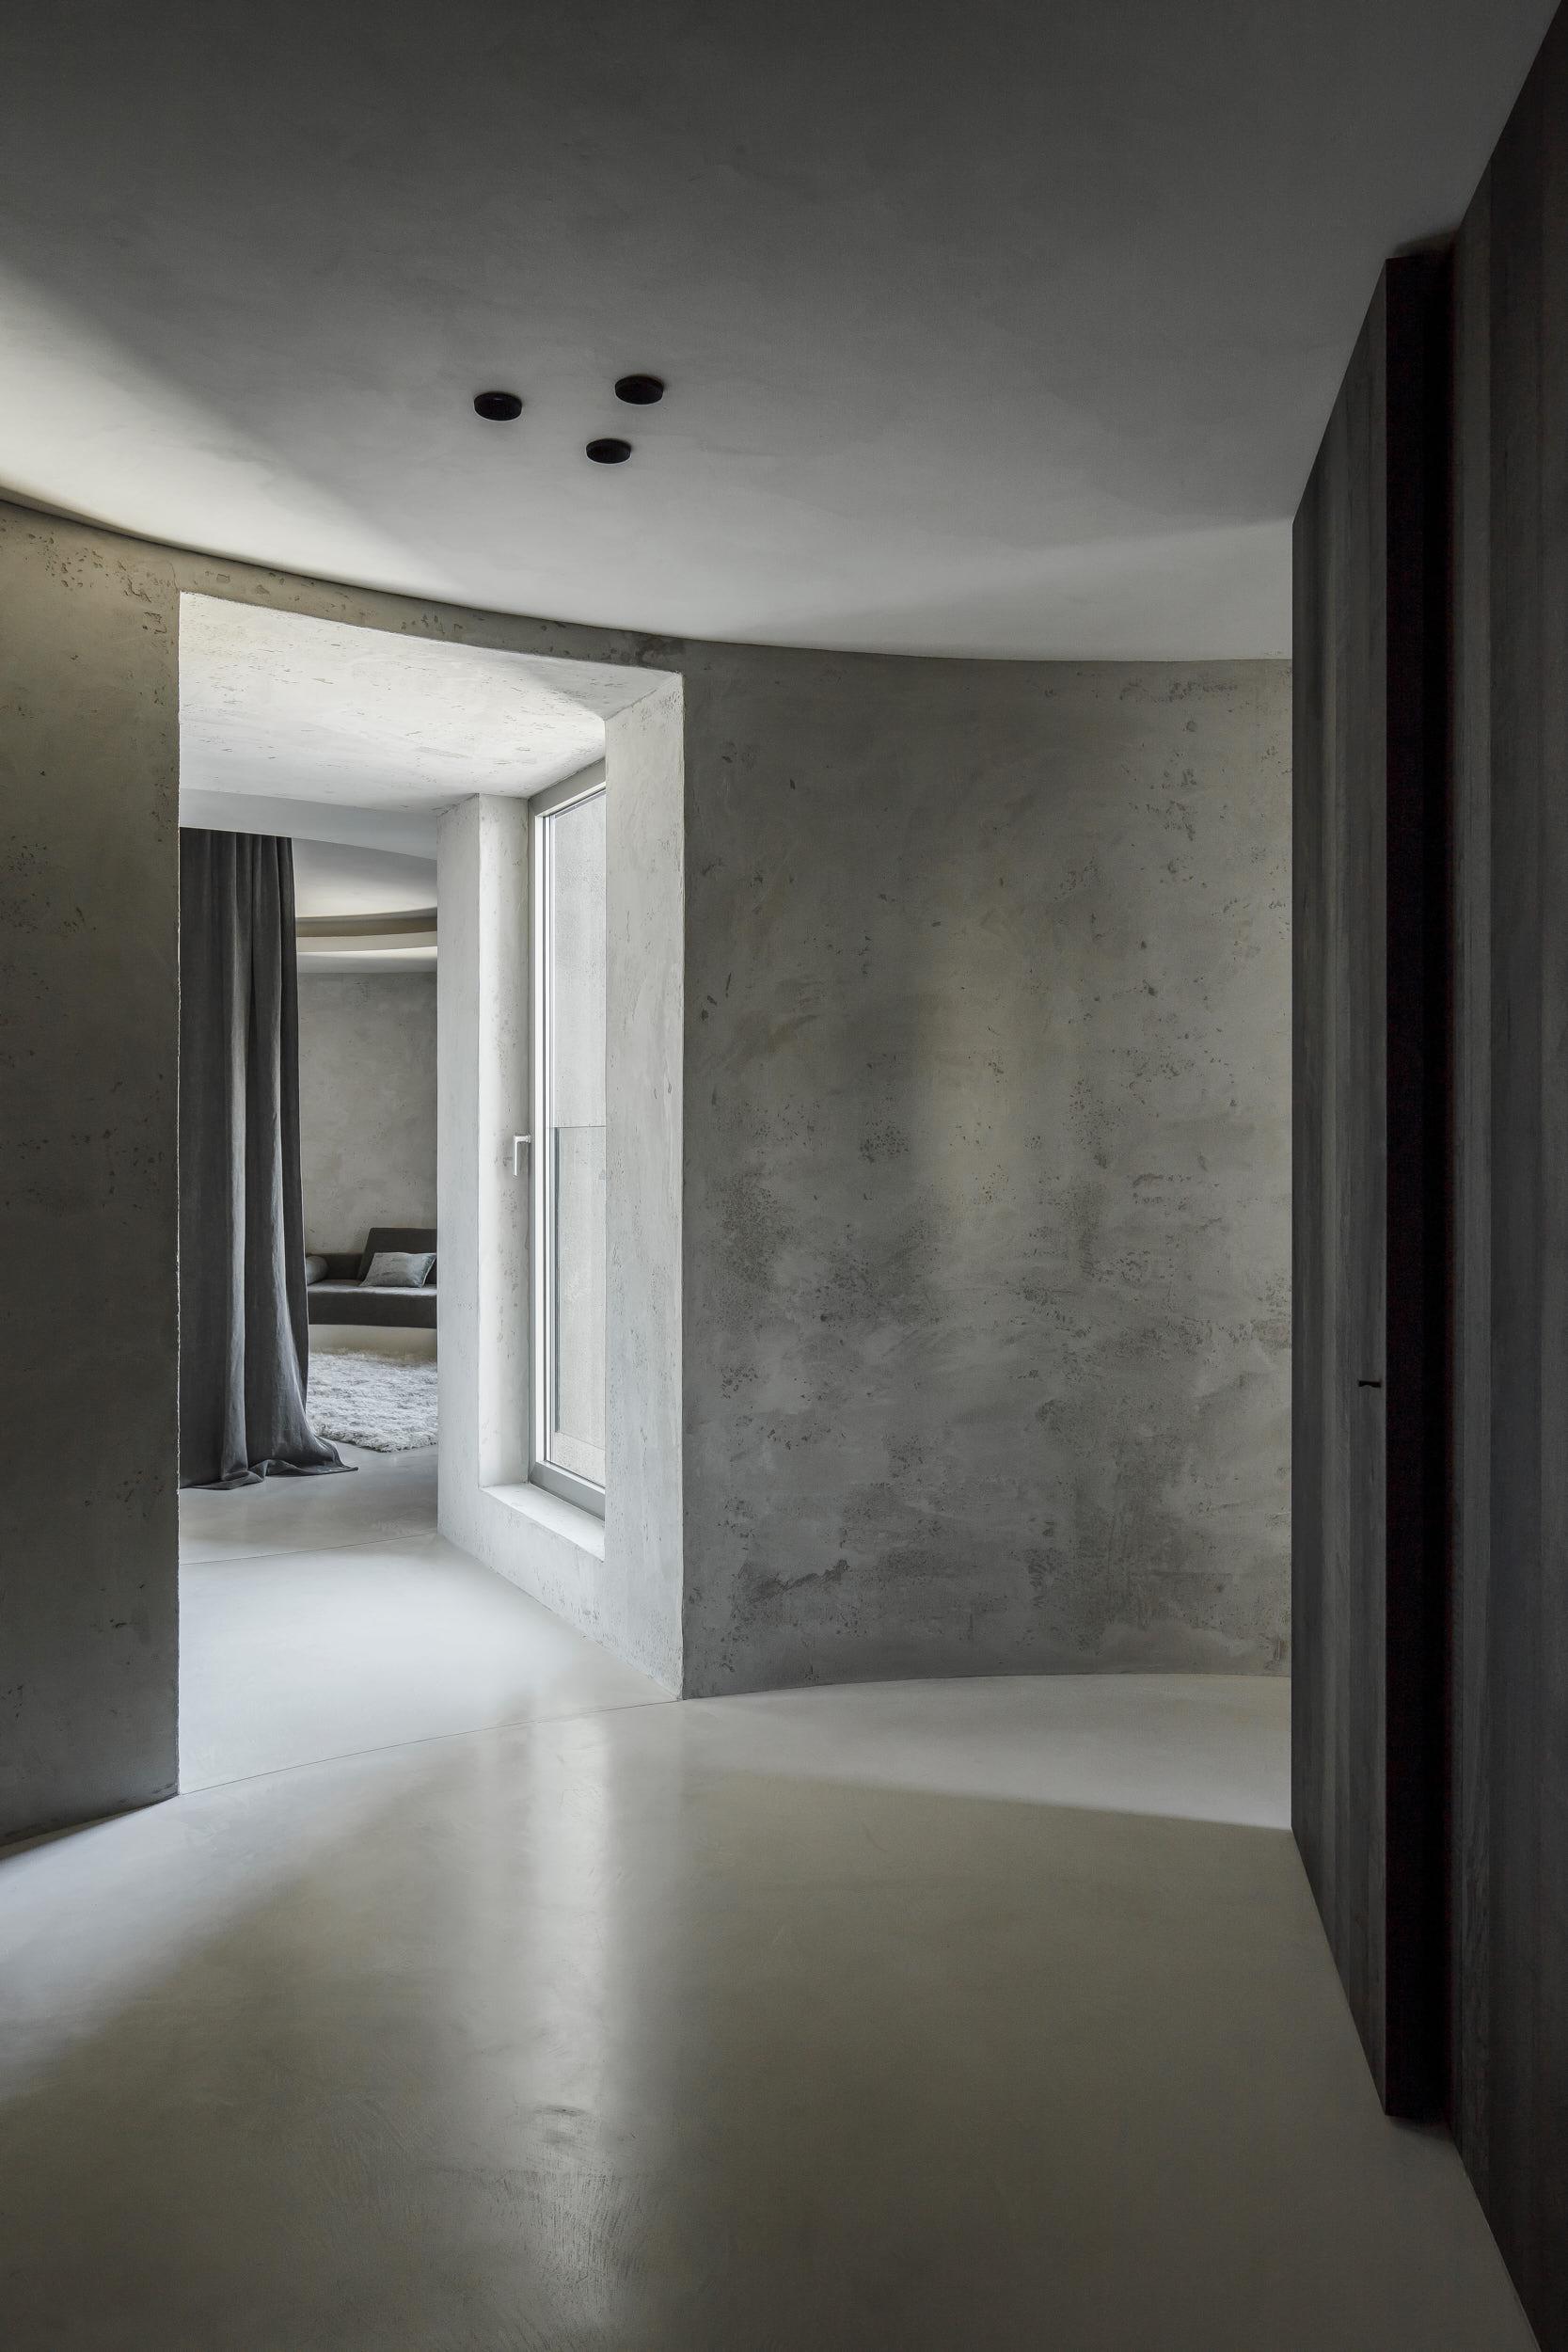 Silo Apartment by Arjaan de Feyter on Anniversary Magazine